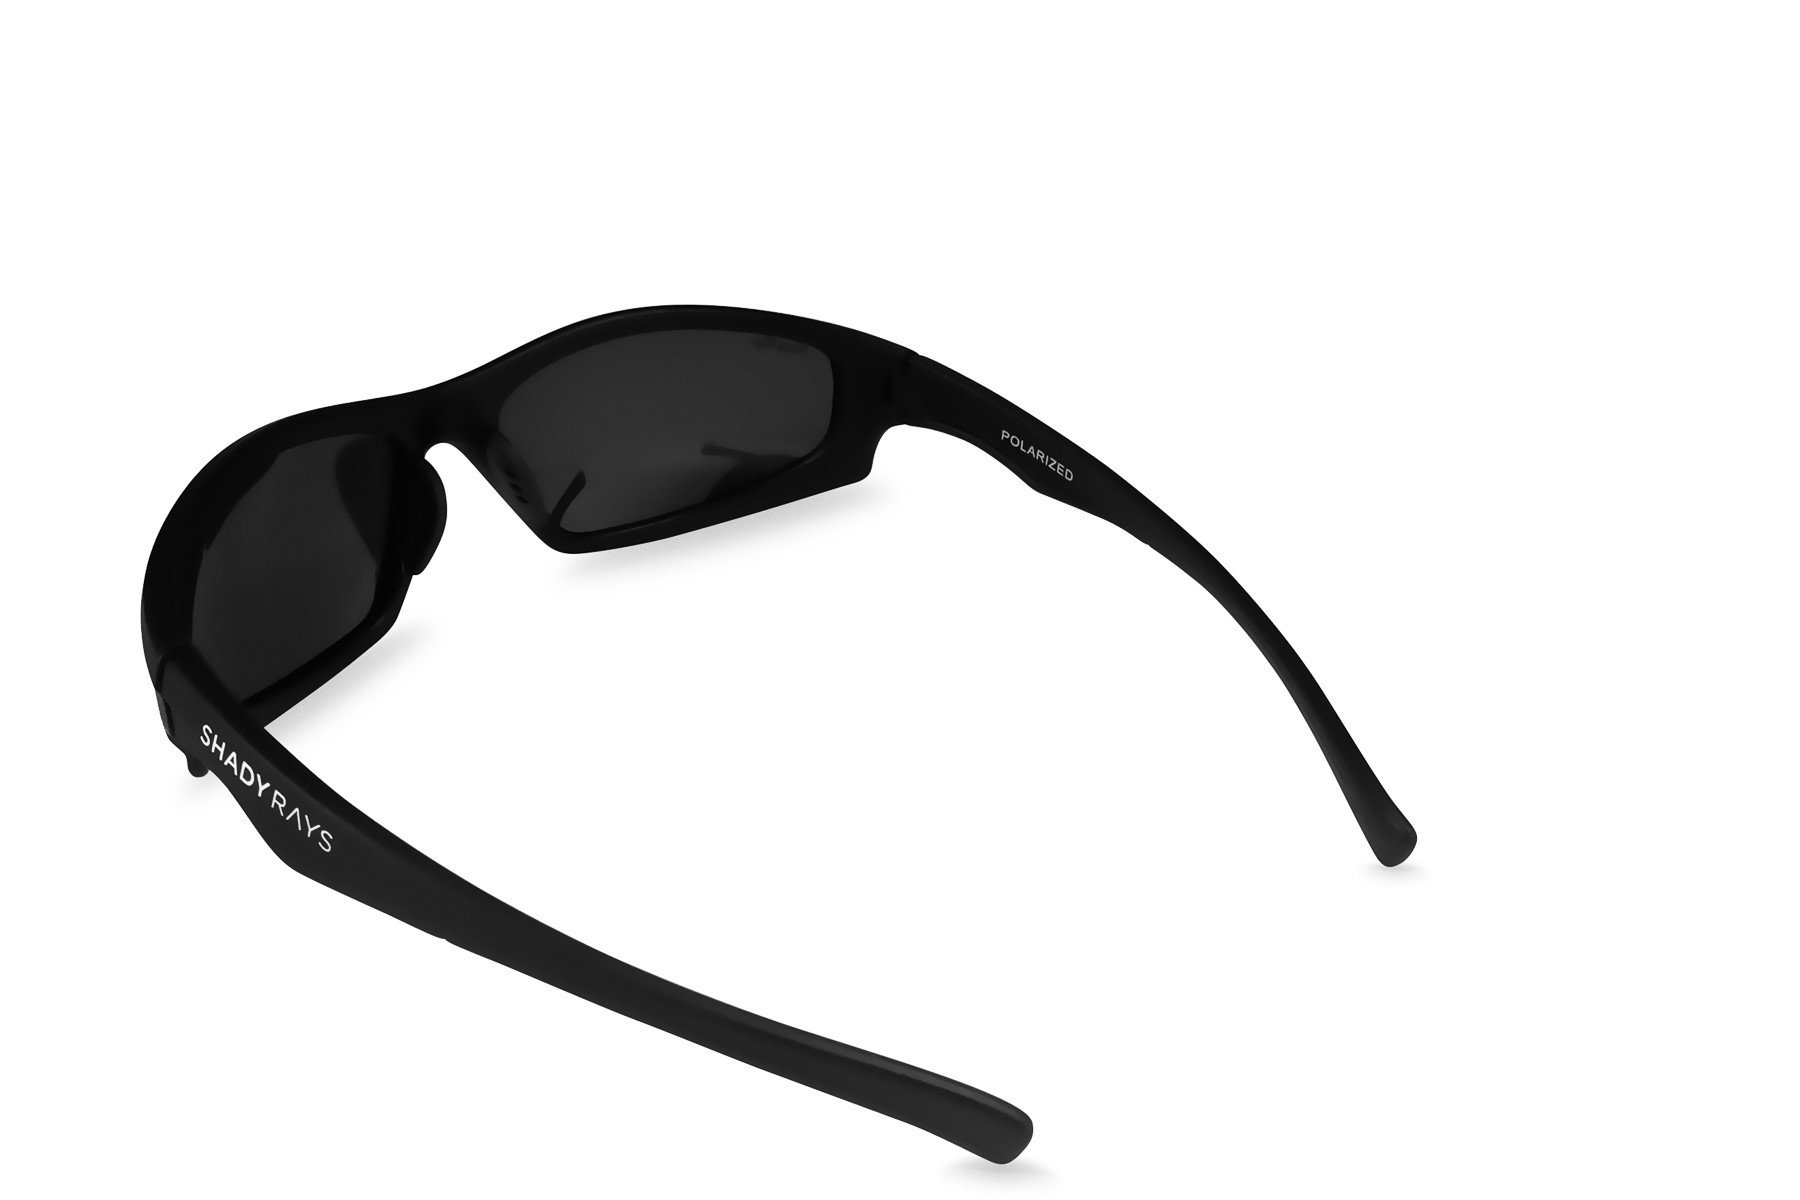 20f126a5d55 Shady Rays X Series Polarized Sport Sunglasses Black Emerald X-2 Sports    Outdoors